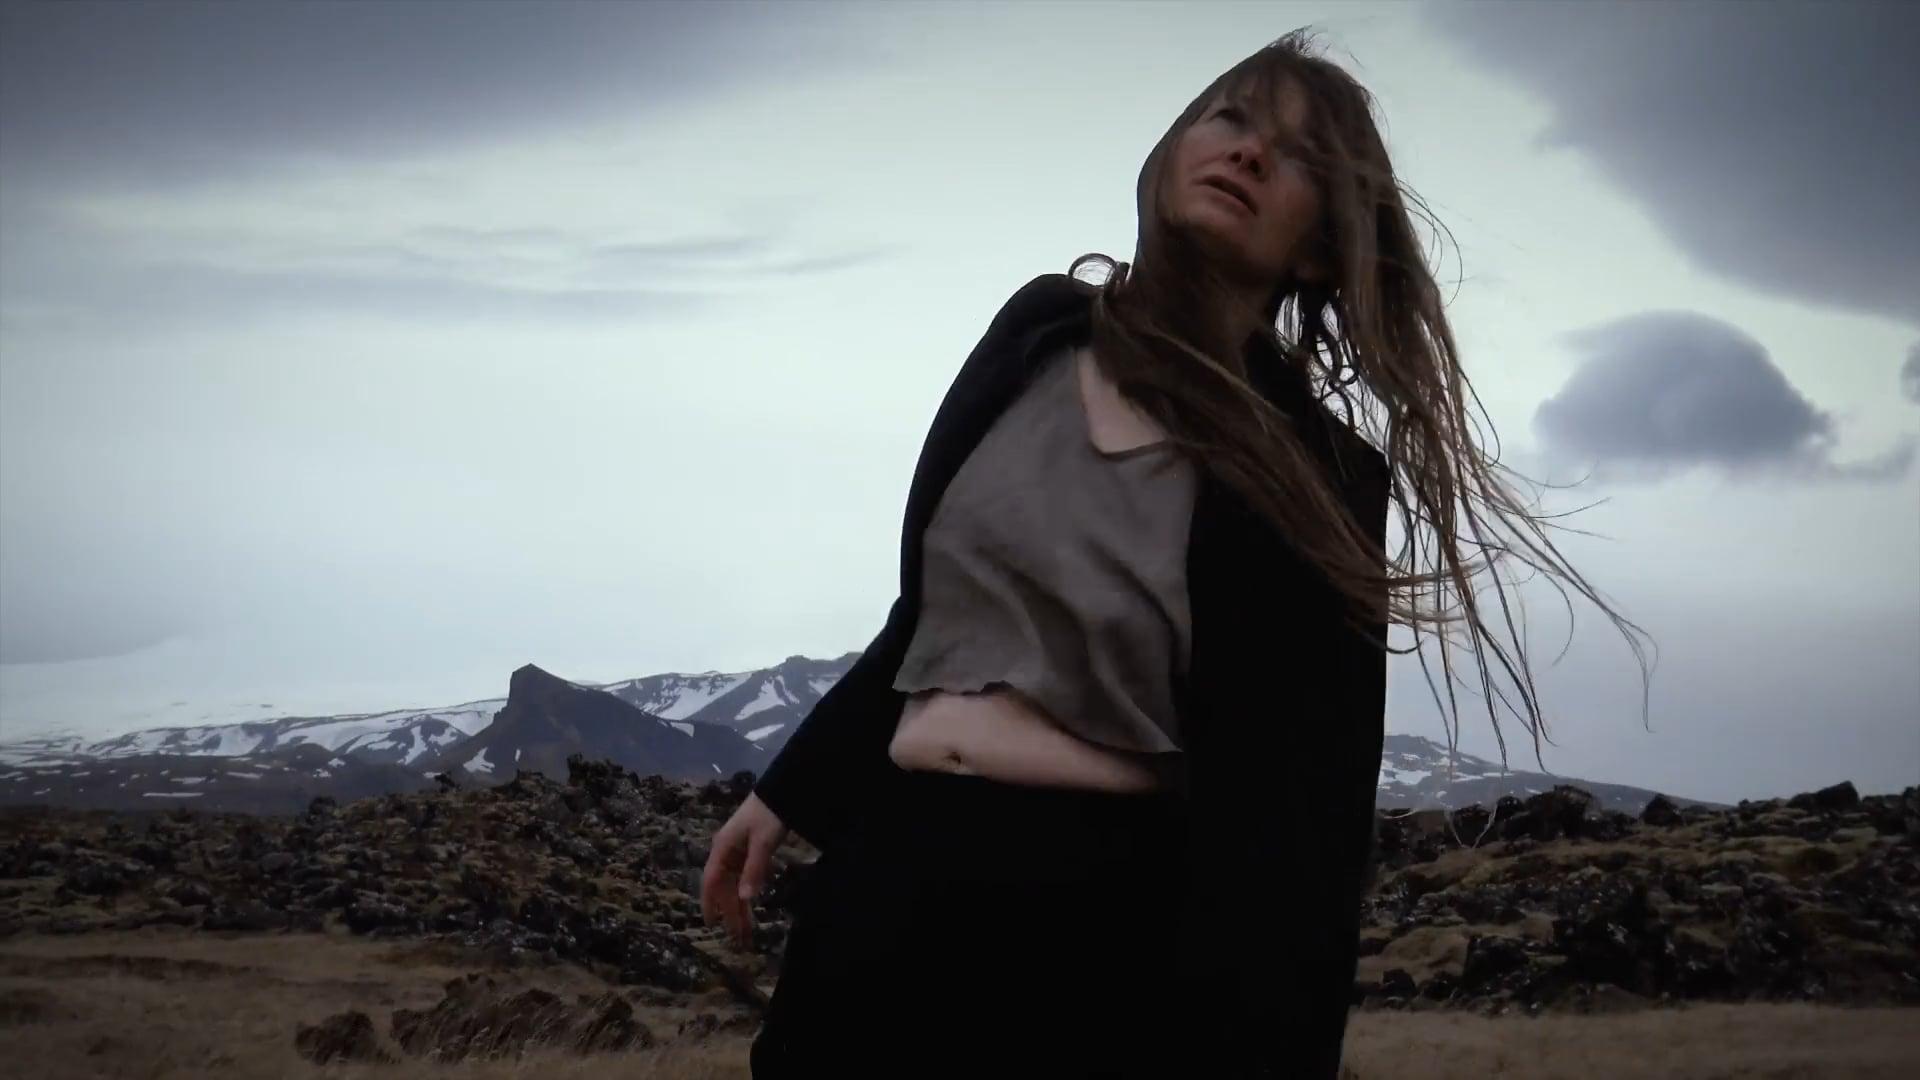 '23° West' - Award winning dance film - Iceland